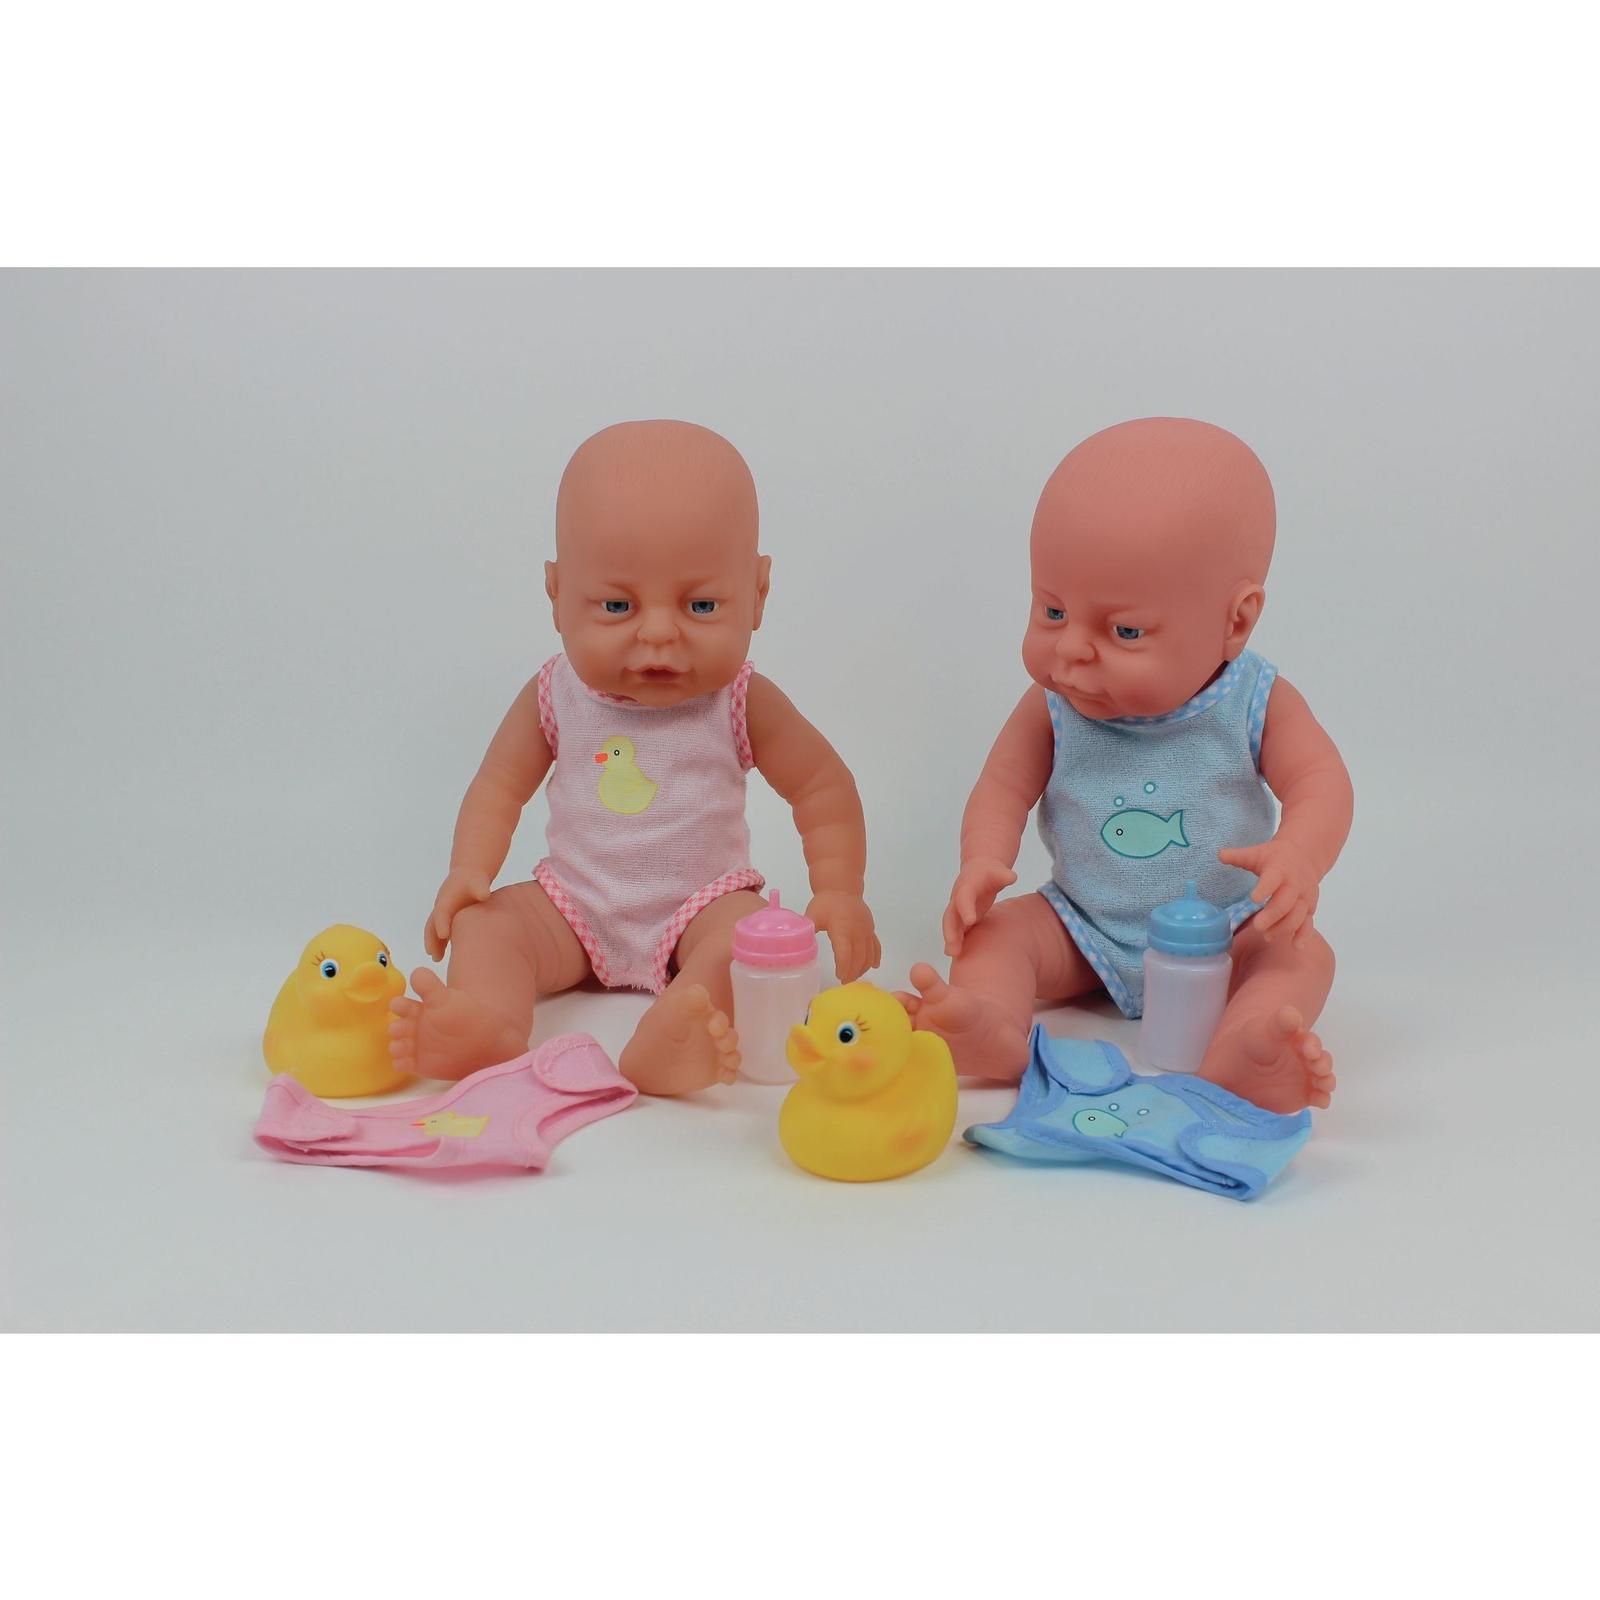 Clothed Newborn Dolls - White Girl